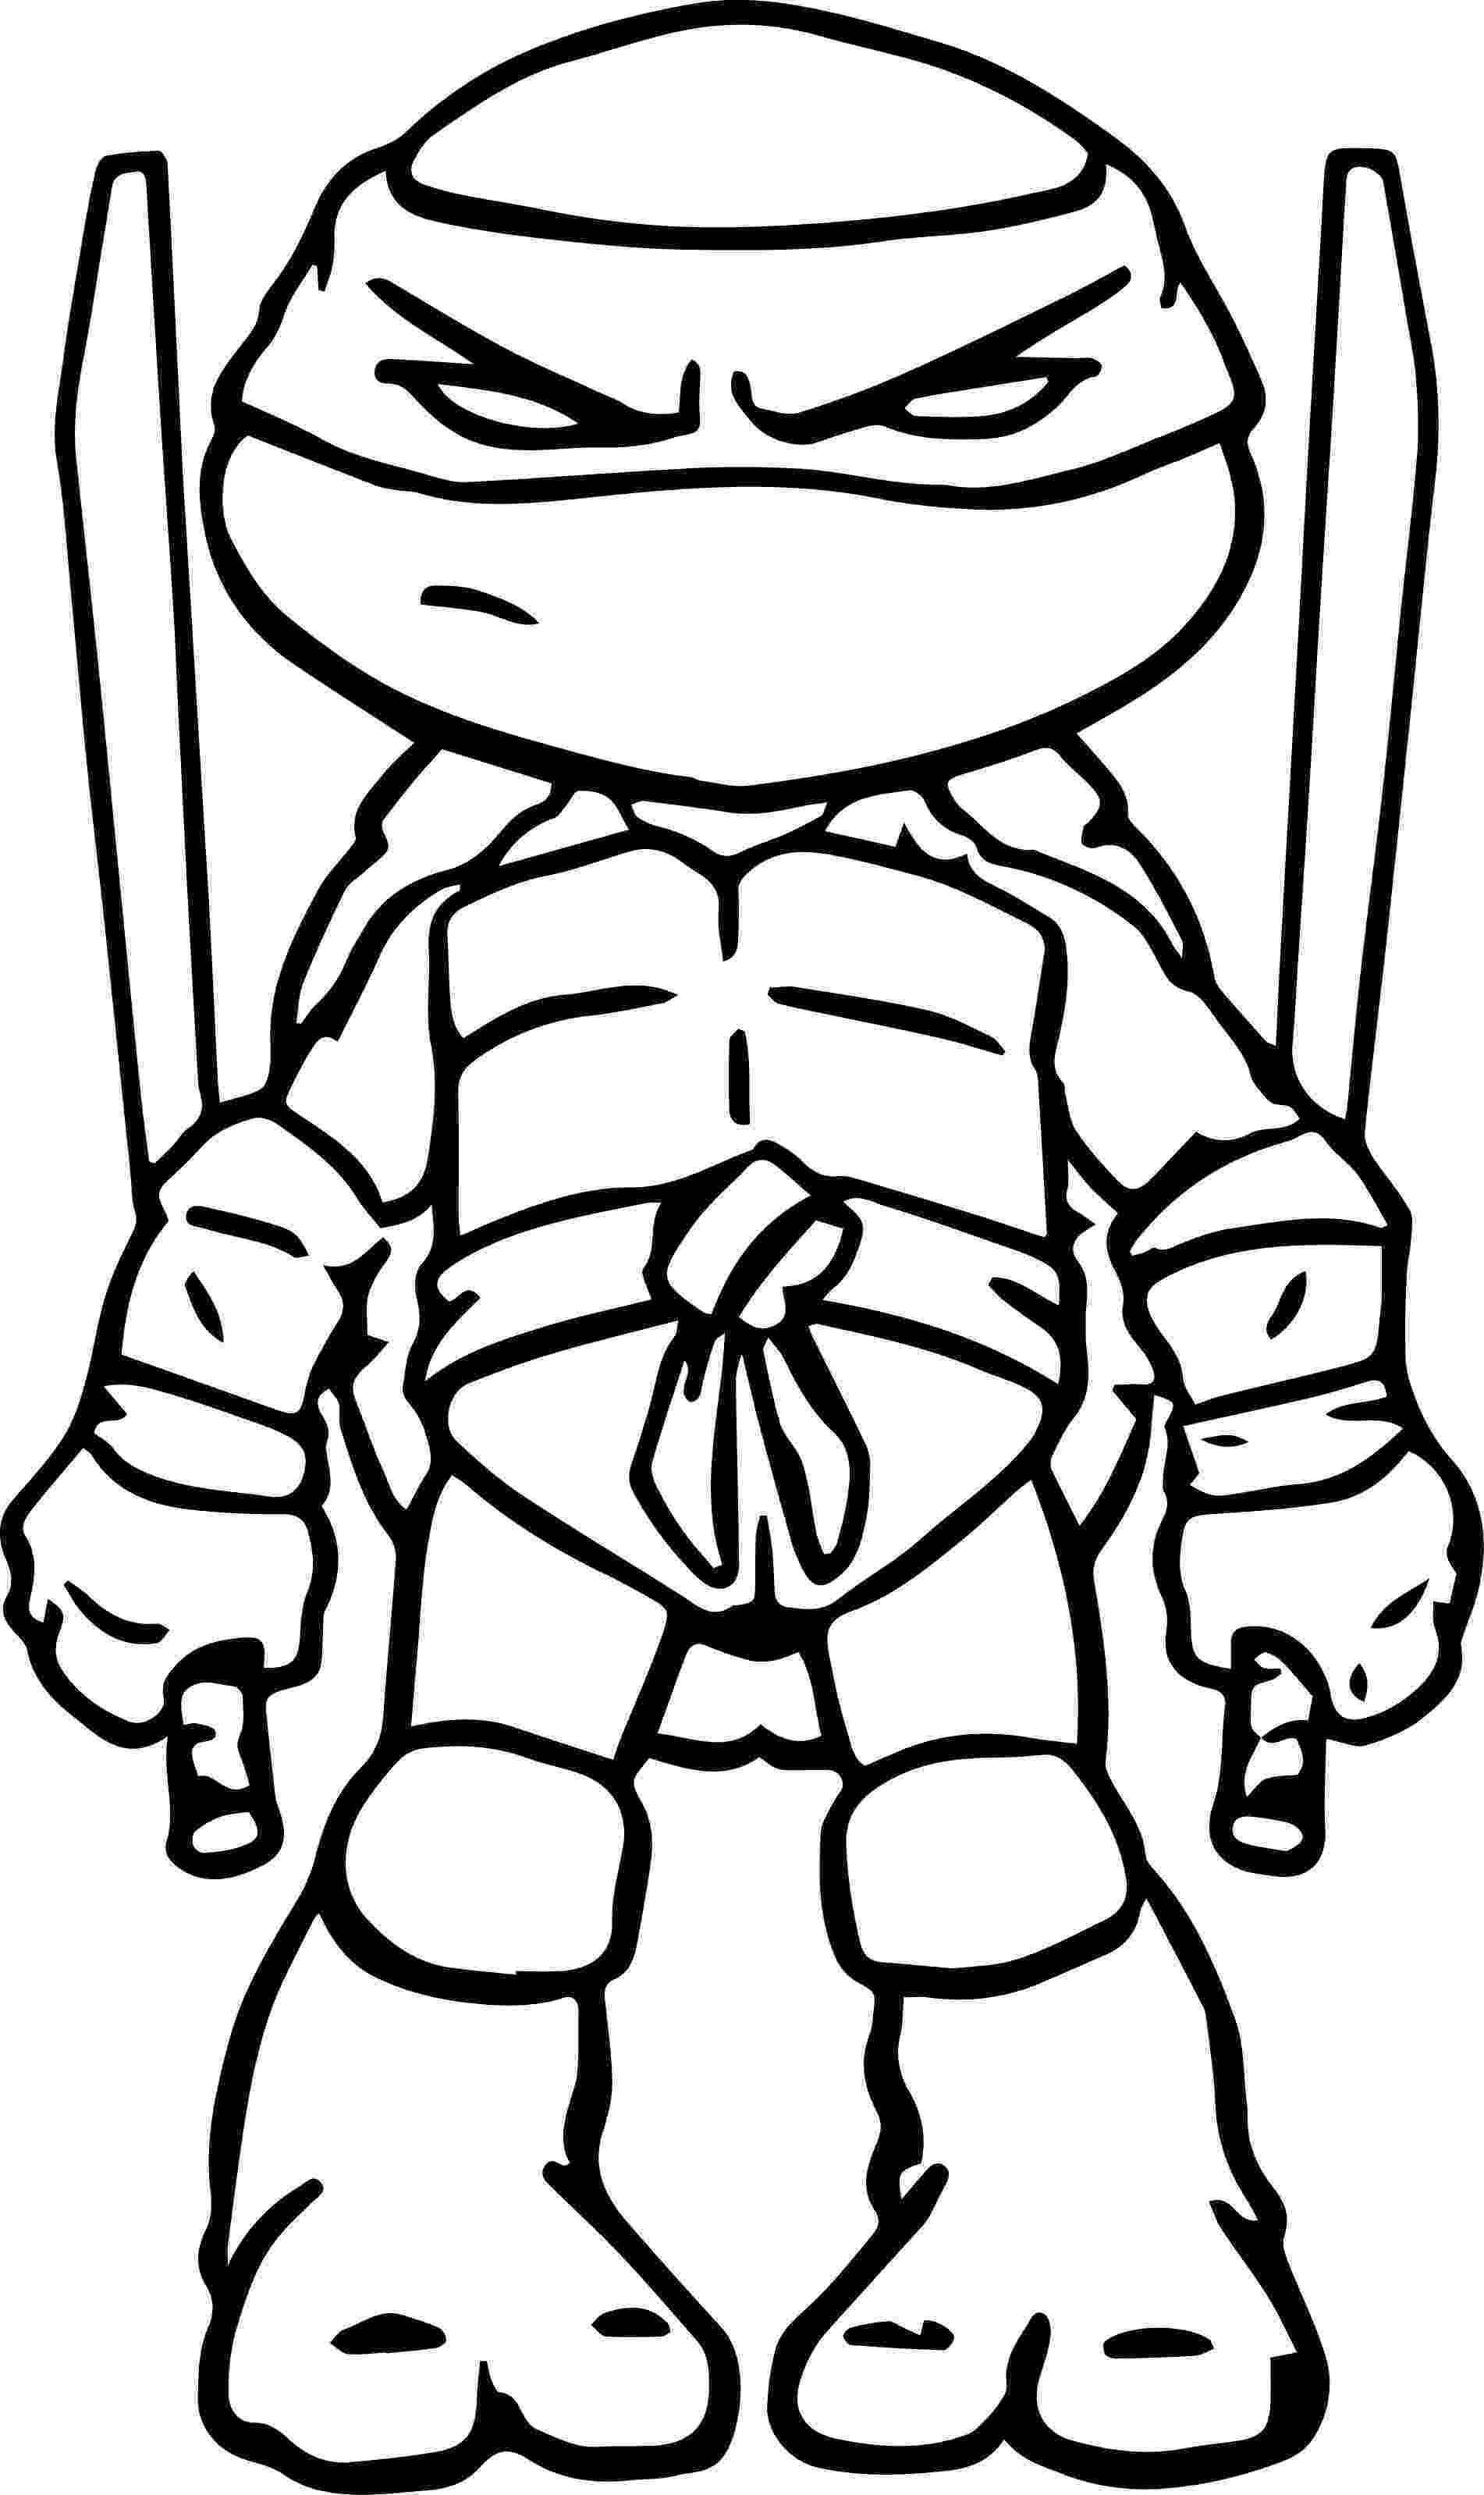 ninja turtle colouring page craftoholic teenage mutant ninja turtles coloring pages turtle ninja colouring page